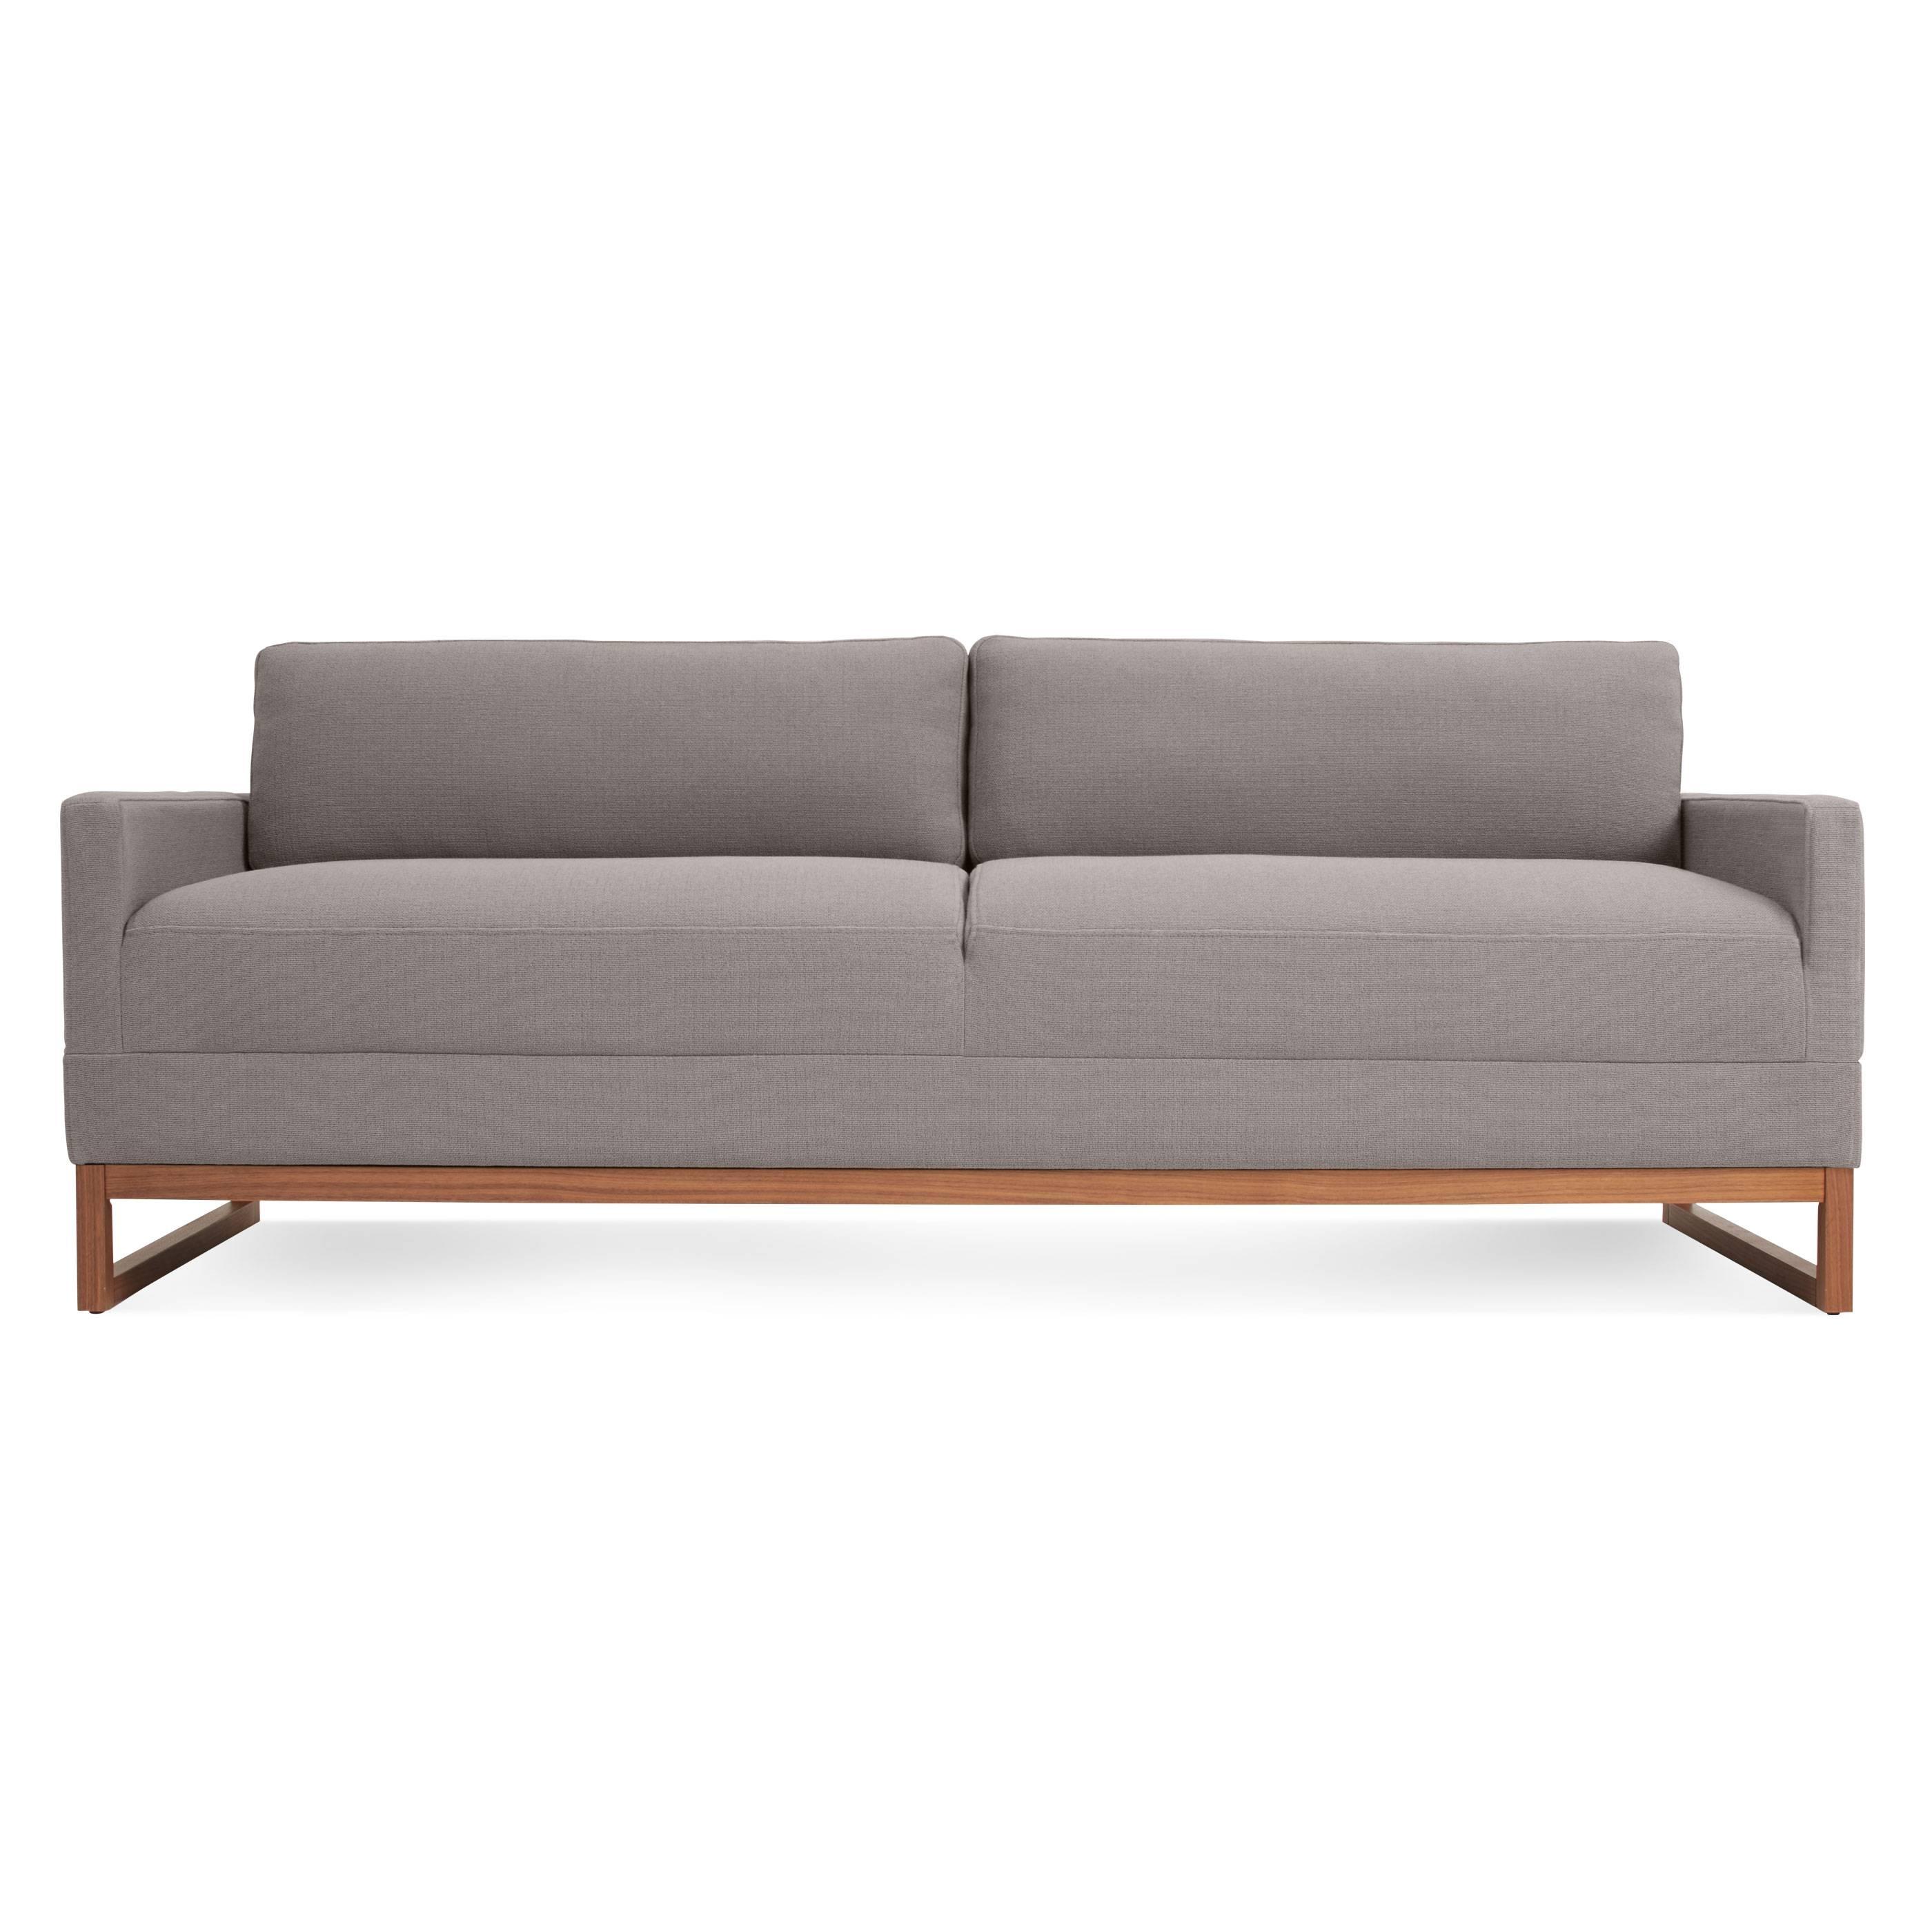 Sleeper Sofa - Diplomat Convertible Sofa | Blu Dot for Blu Dot Sofas (Image 13 of 15)